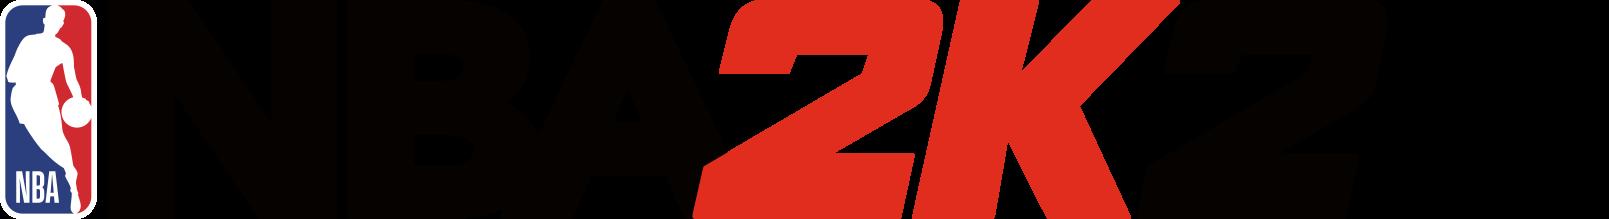 2k22 Logo